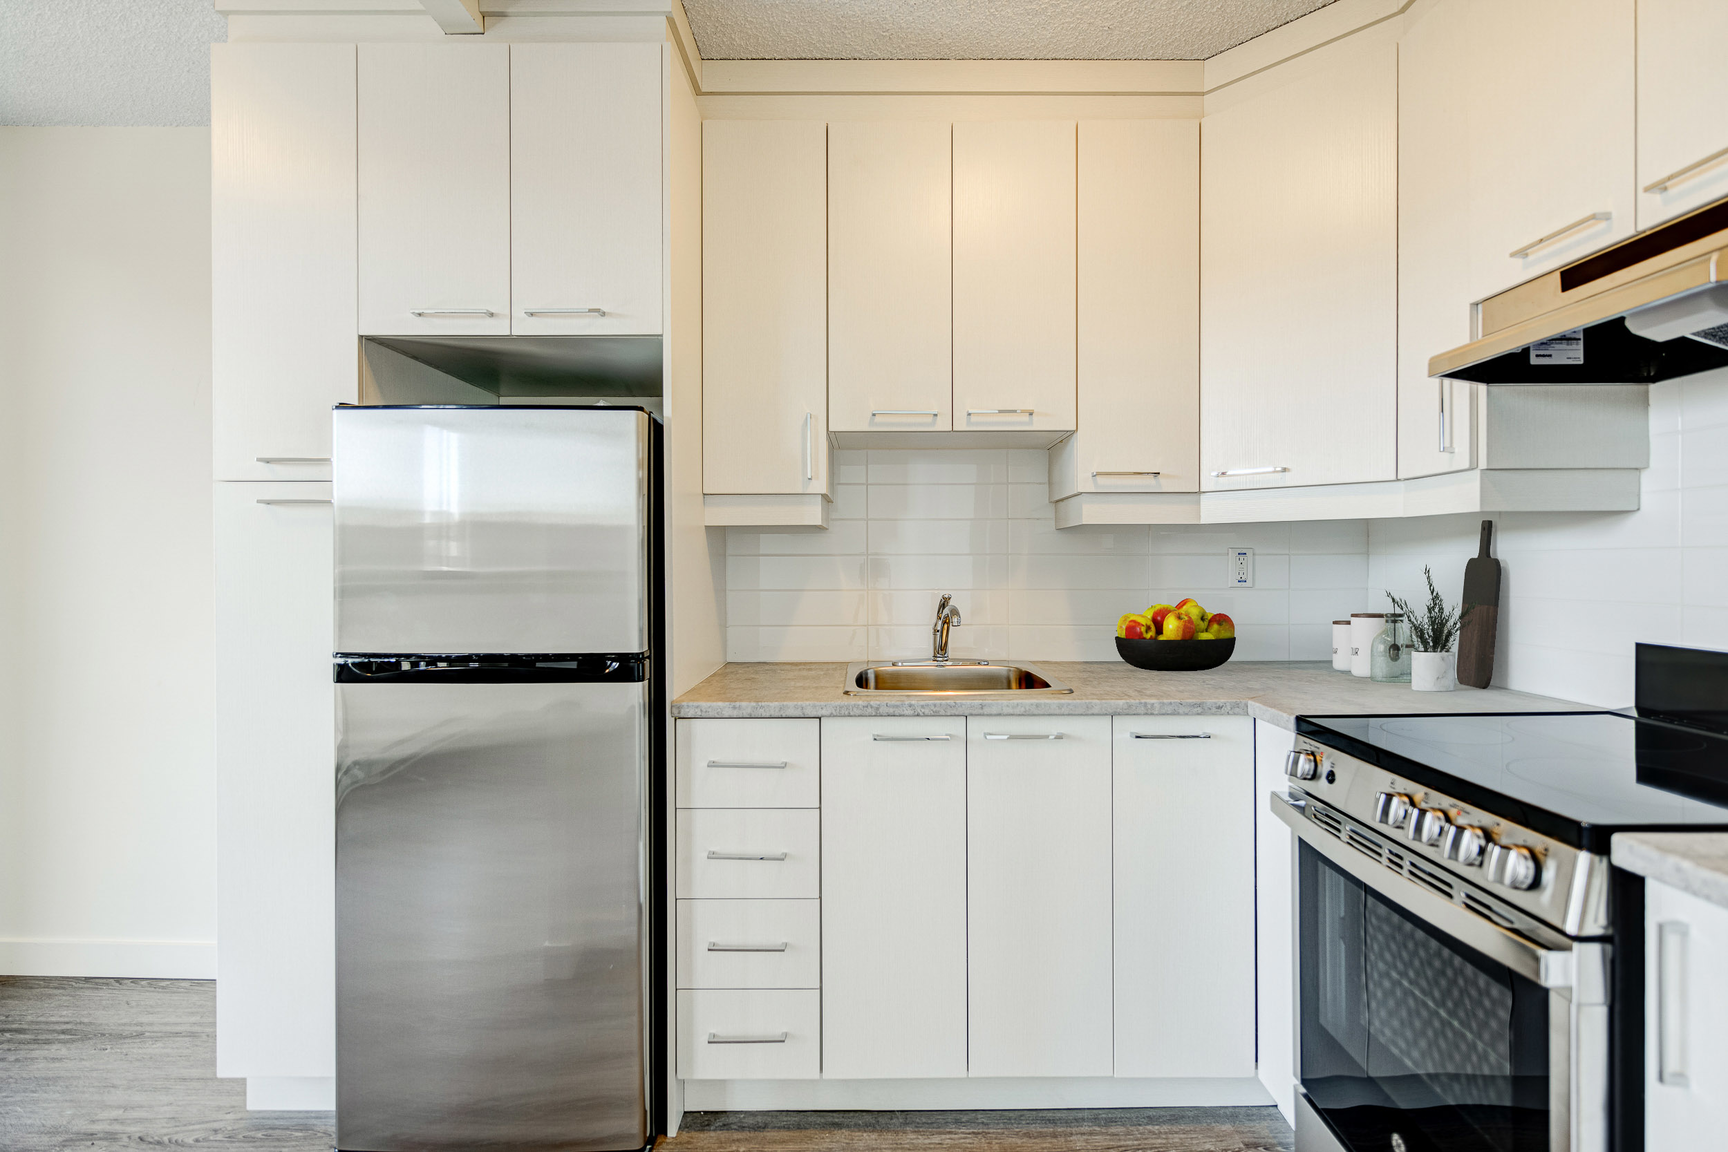 1 bedroom Apartments for rent in Laval at Le Quatre Cent - Photo 09 - RentQuebecApartments – L407183